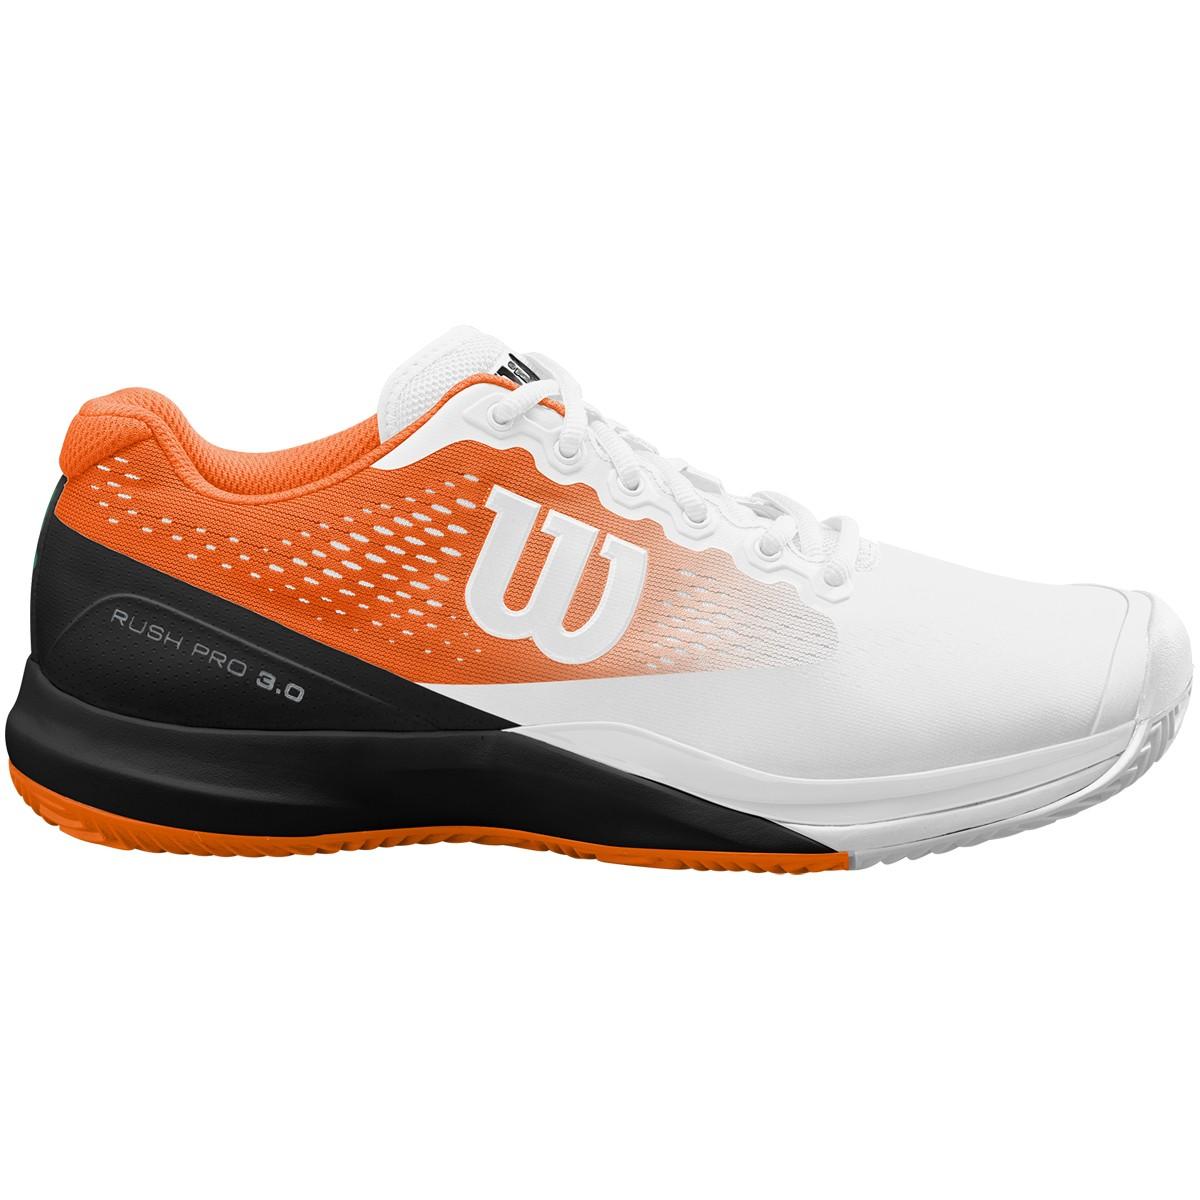 Chaussures wilson rush pro 3.0 paris terre battue